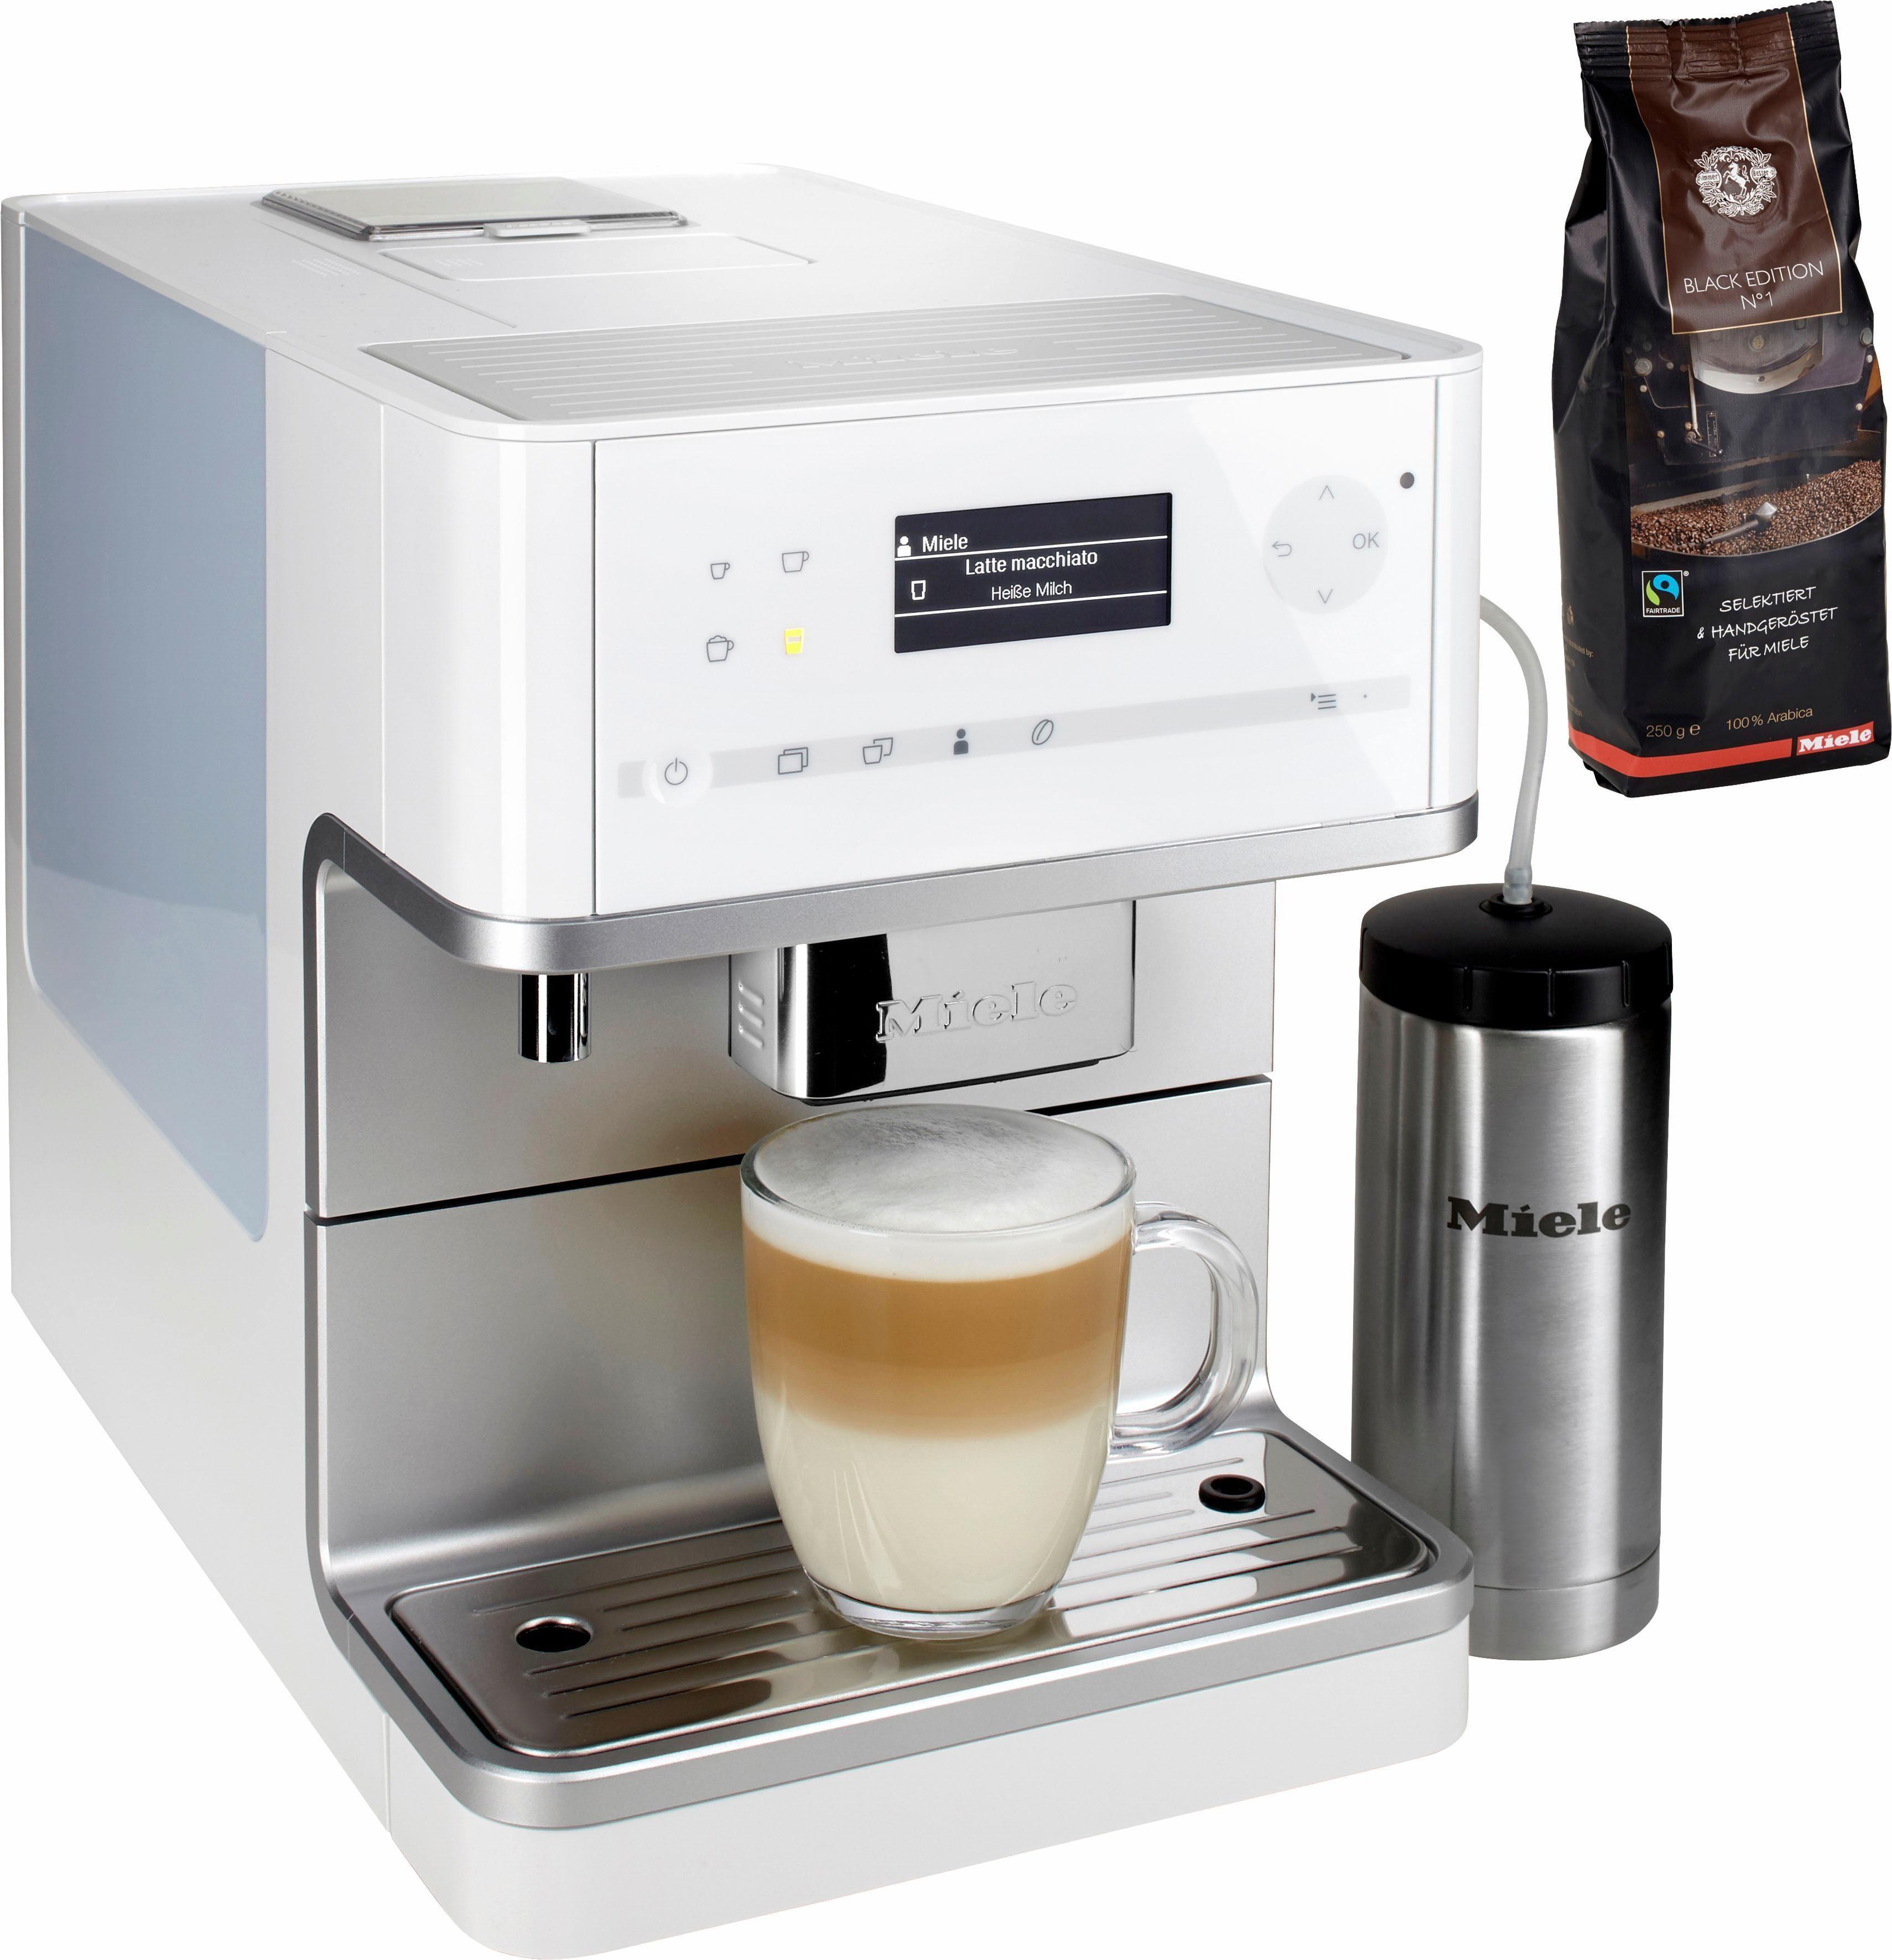 Miele Kaffeevollautomat CM 6350, 1,8l Tank, Kegelmahlwerk, mit Isoliermilchbehälter